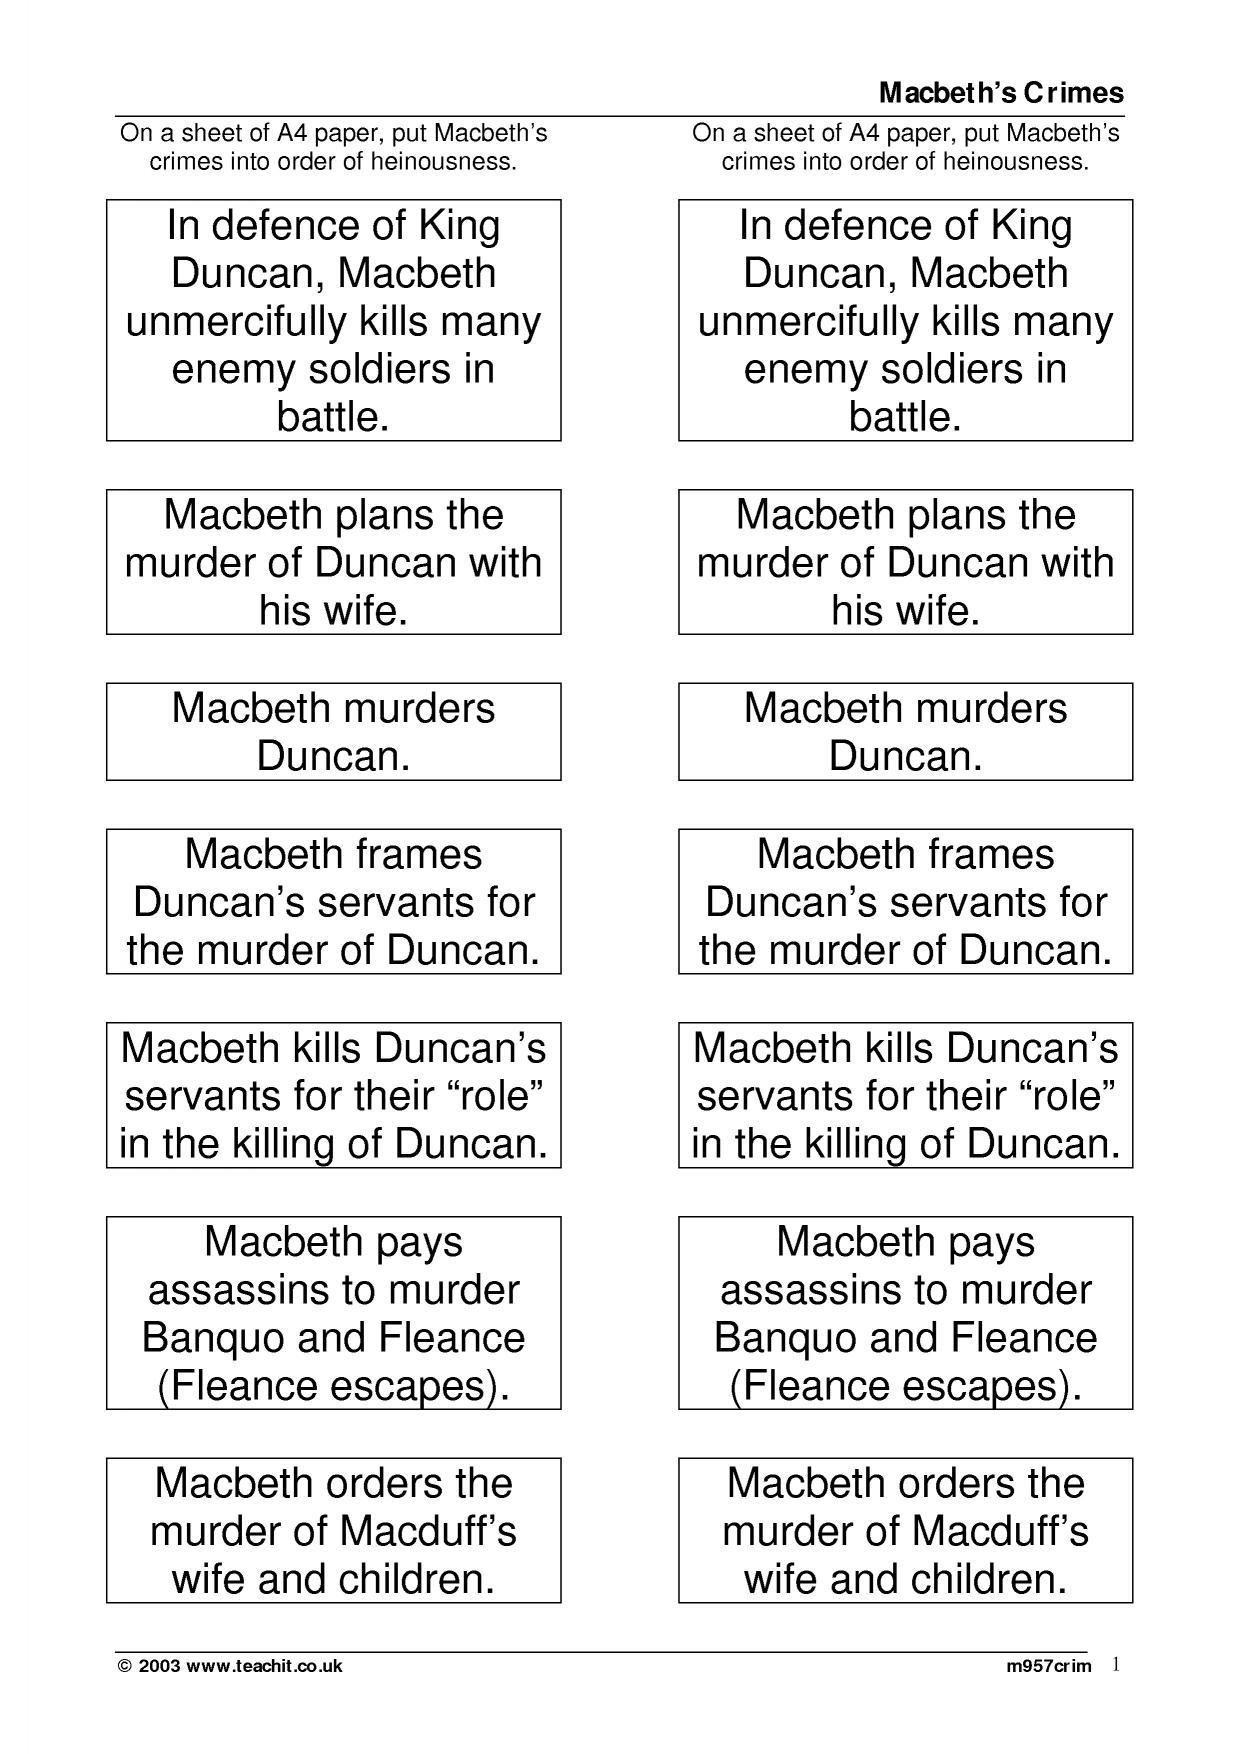 download pdf file of macbeth